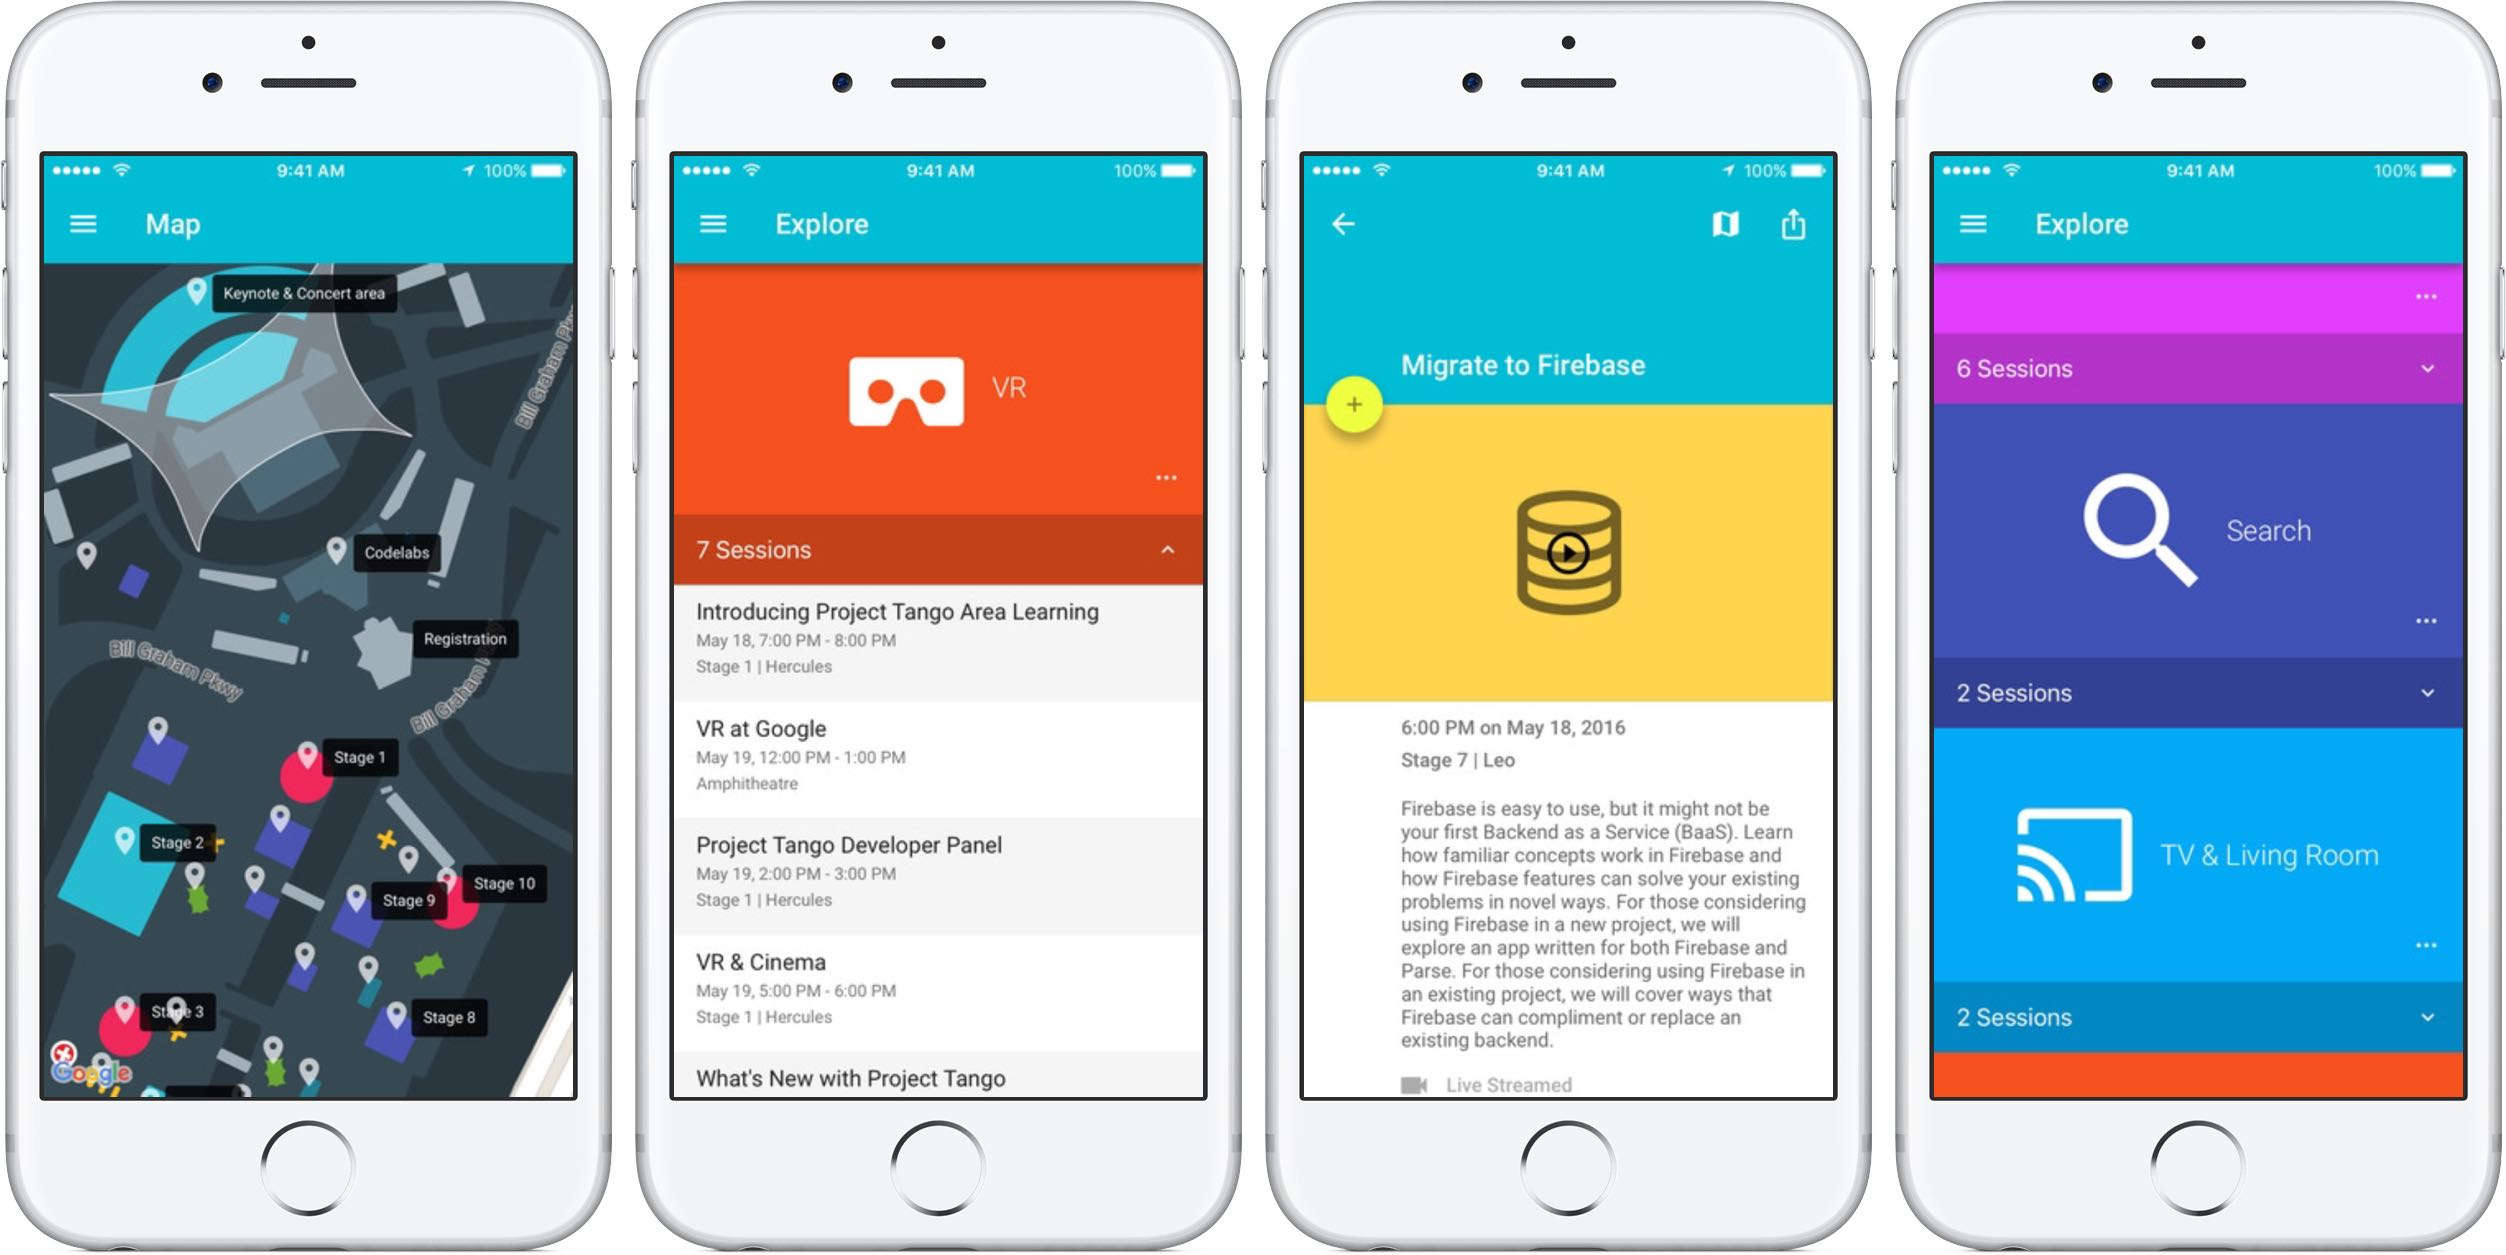 Google IO 2016 1.2 for iOS iPHone screenshot 001